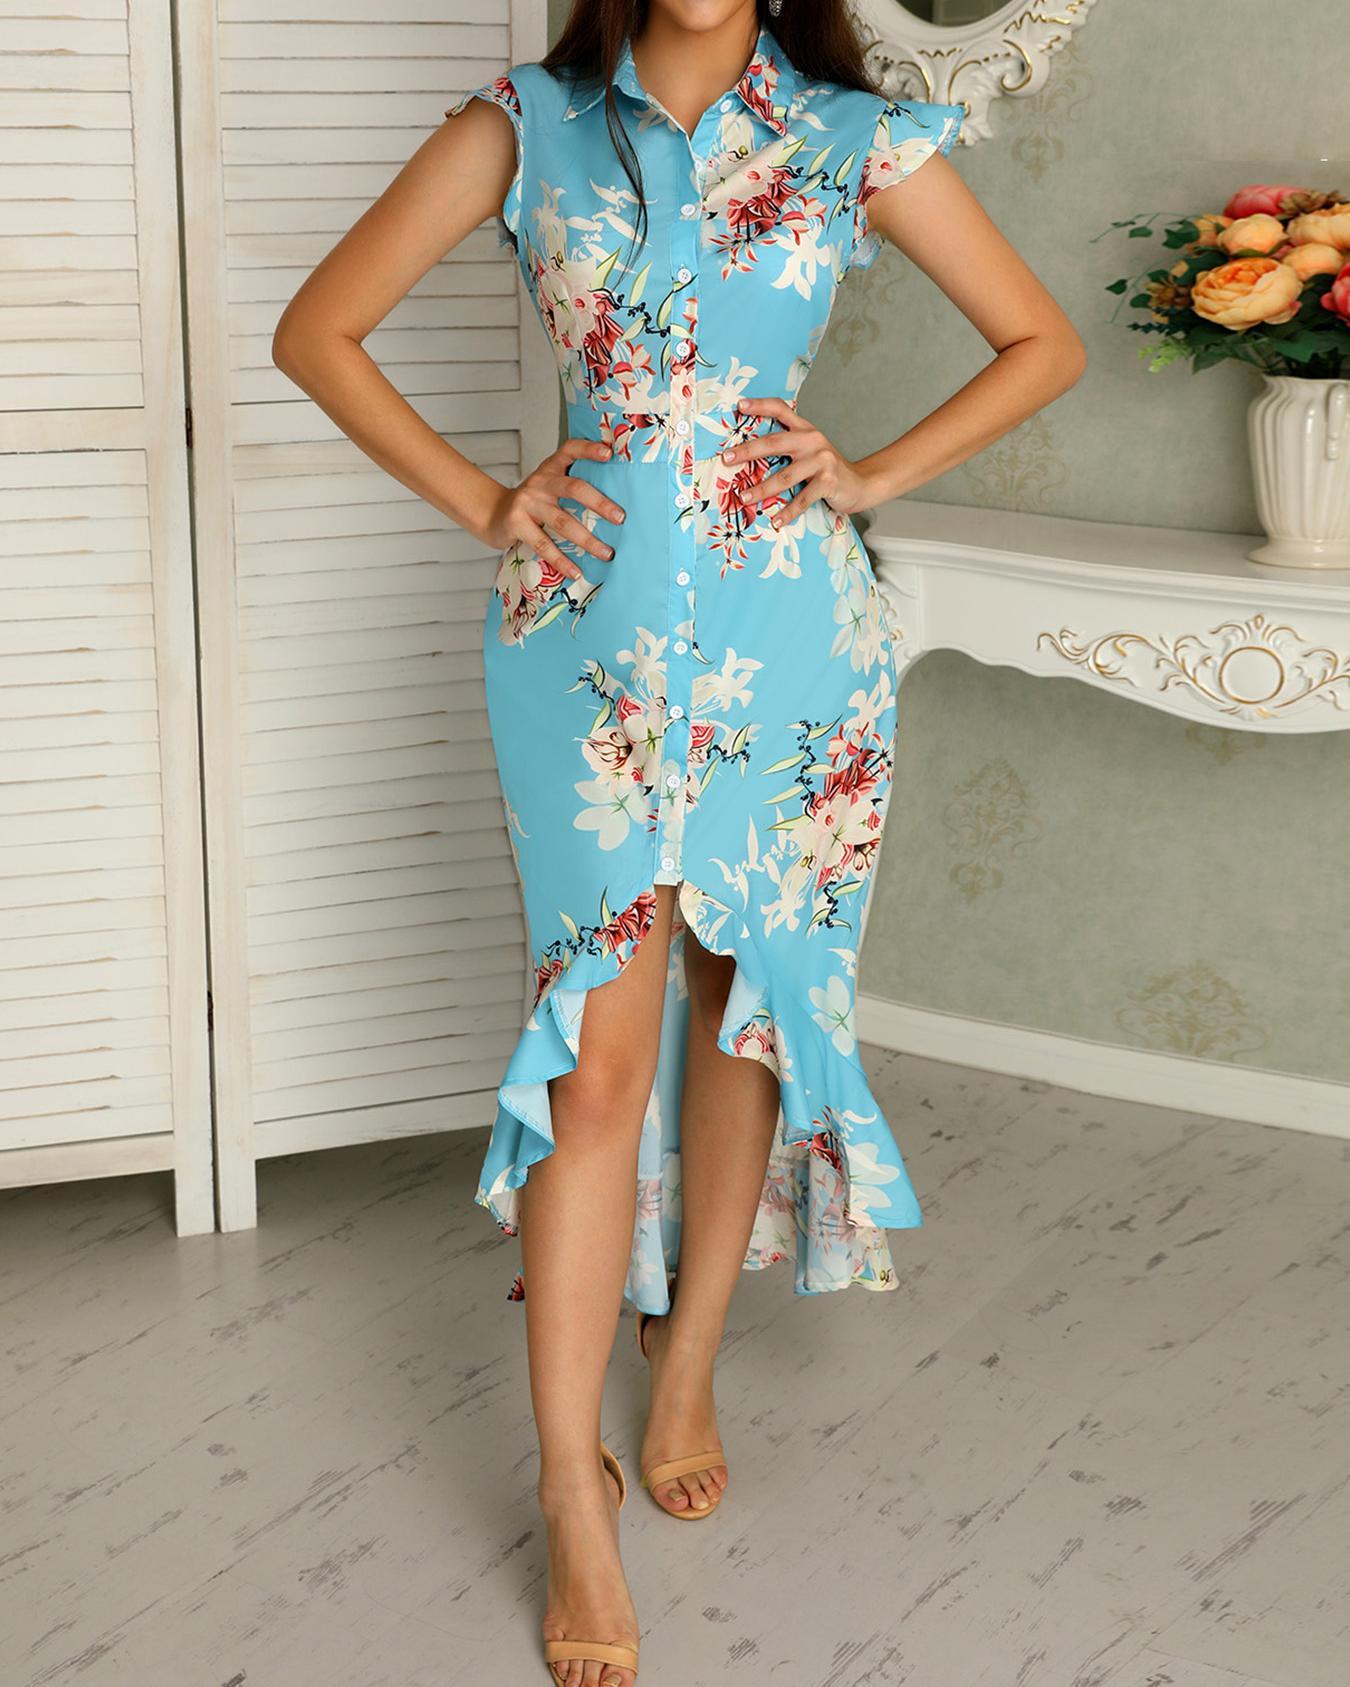 joyshoetique / Floral Print Ruffled Dip Hem Maxi Dress